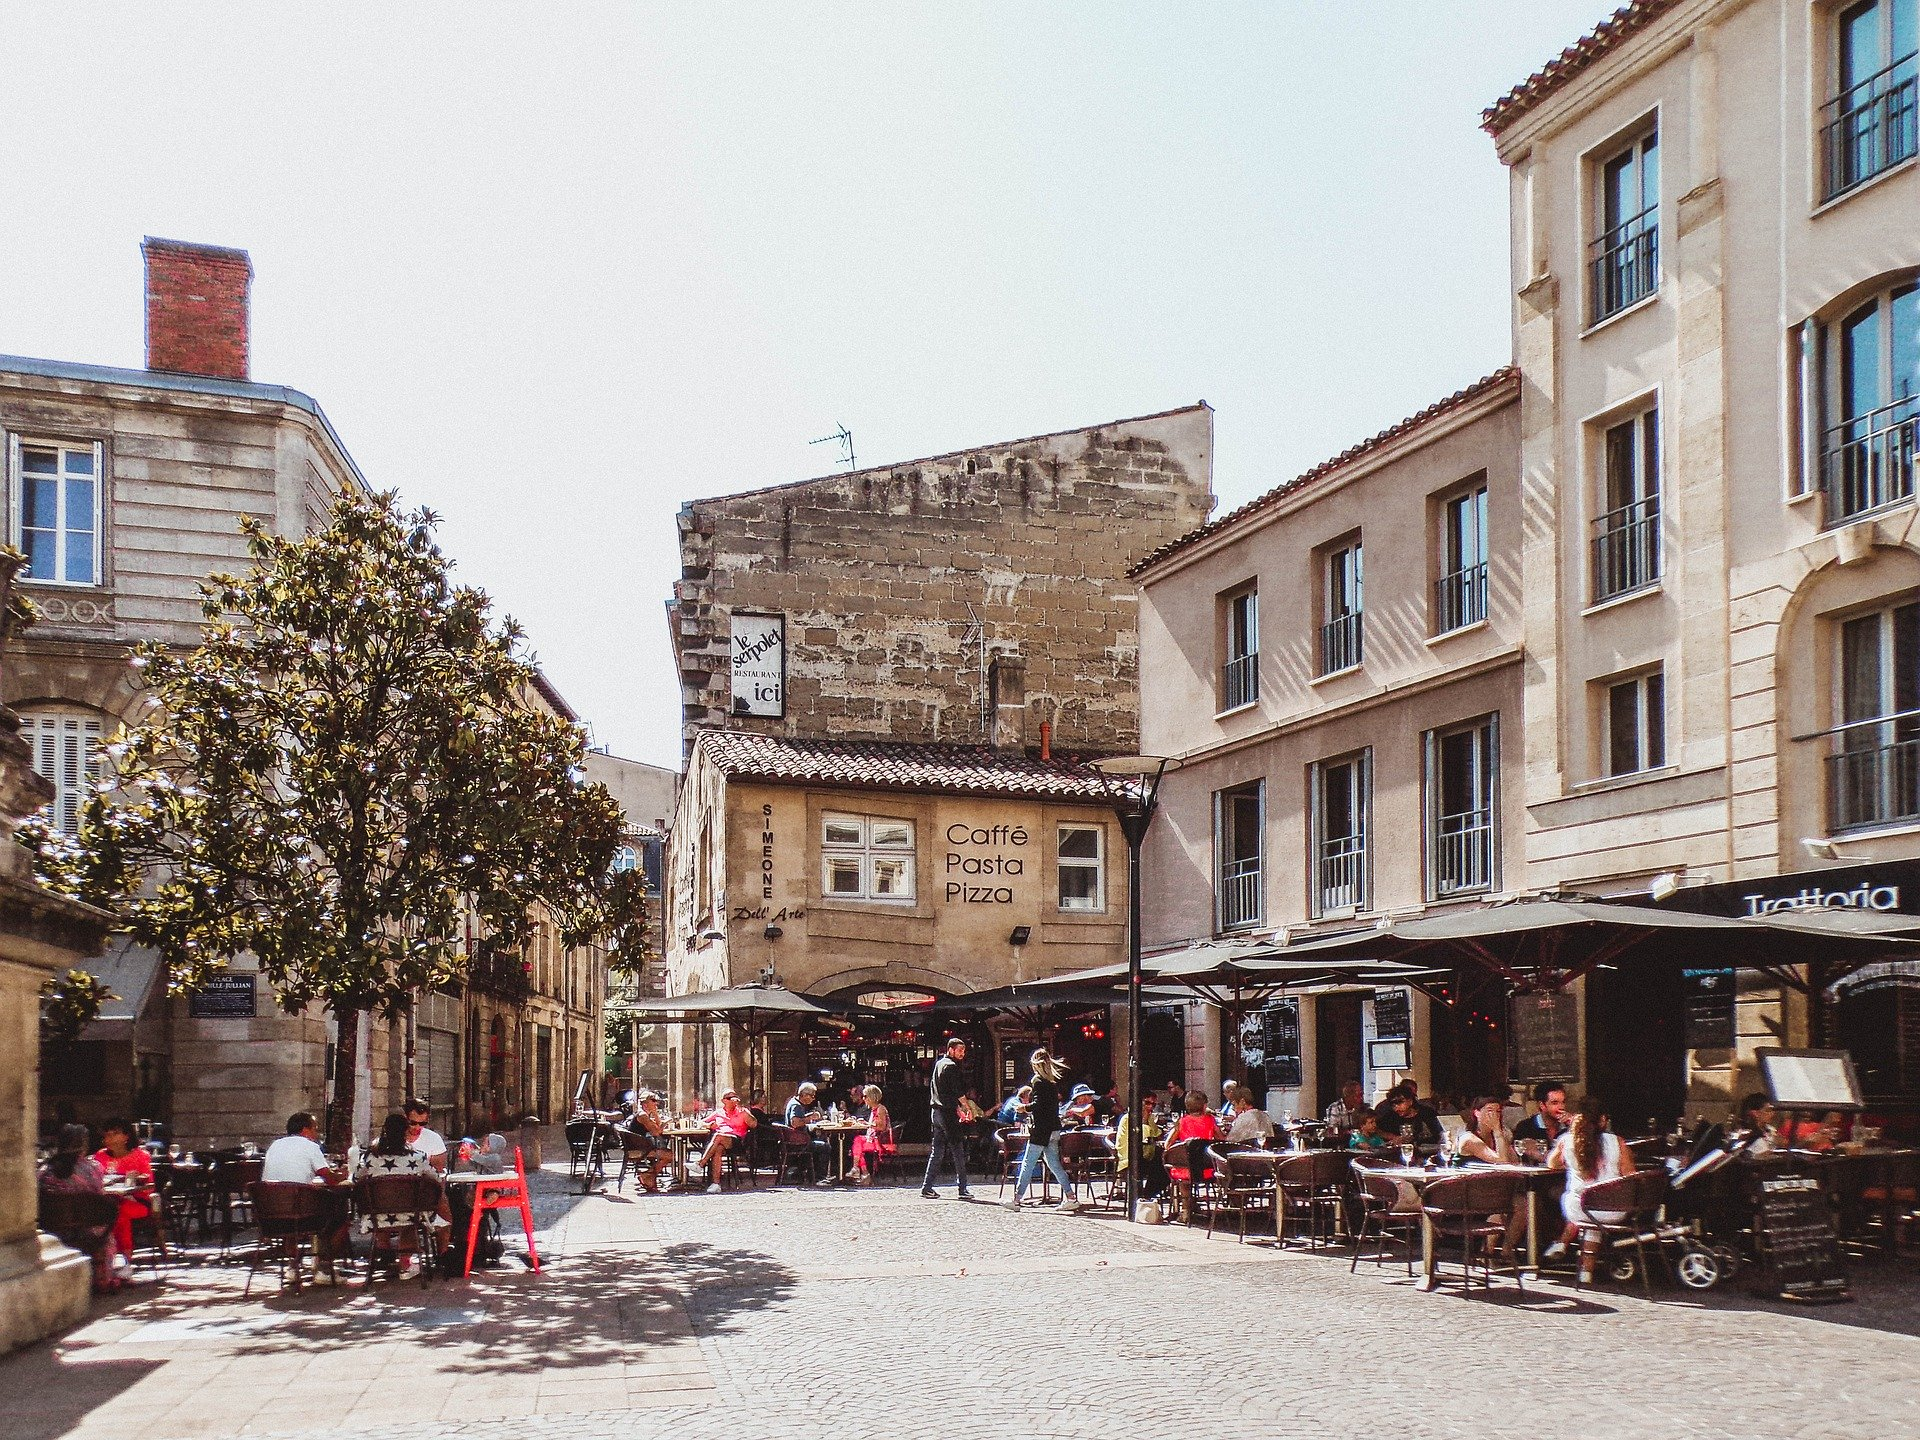 Place Camille-Jullian in Bordeaux